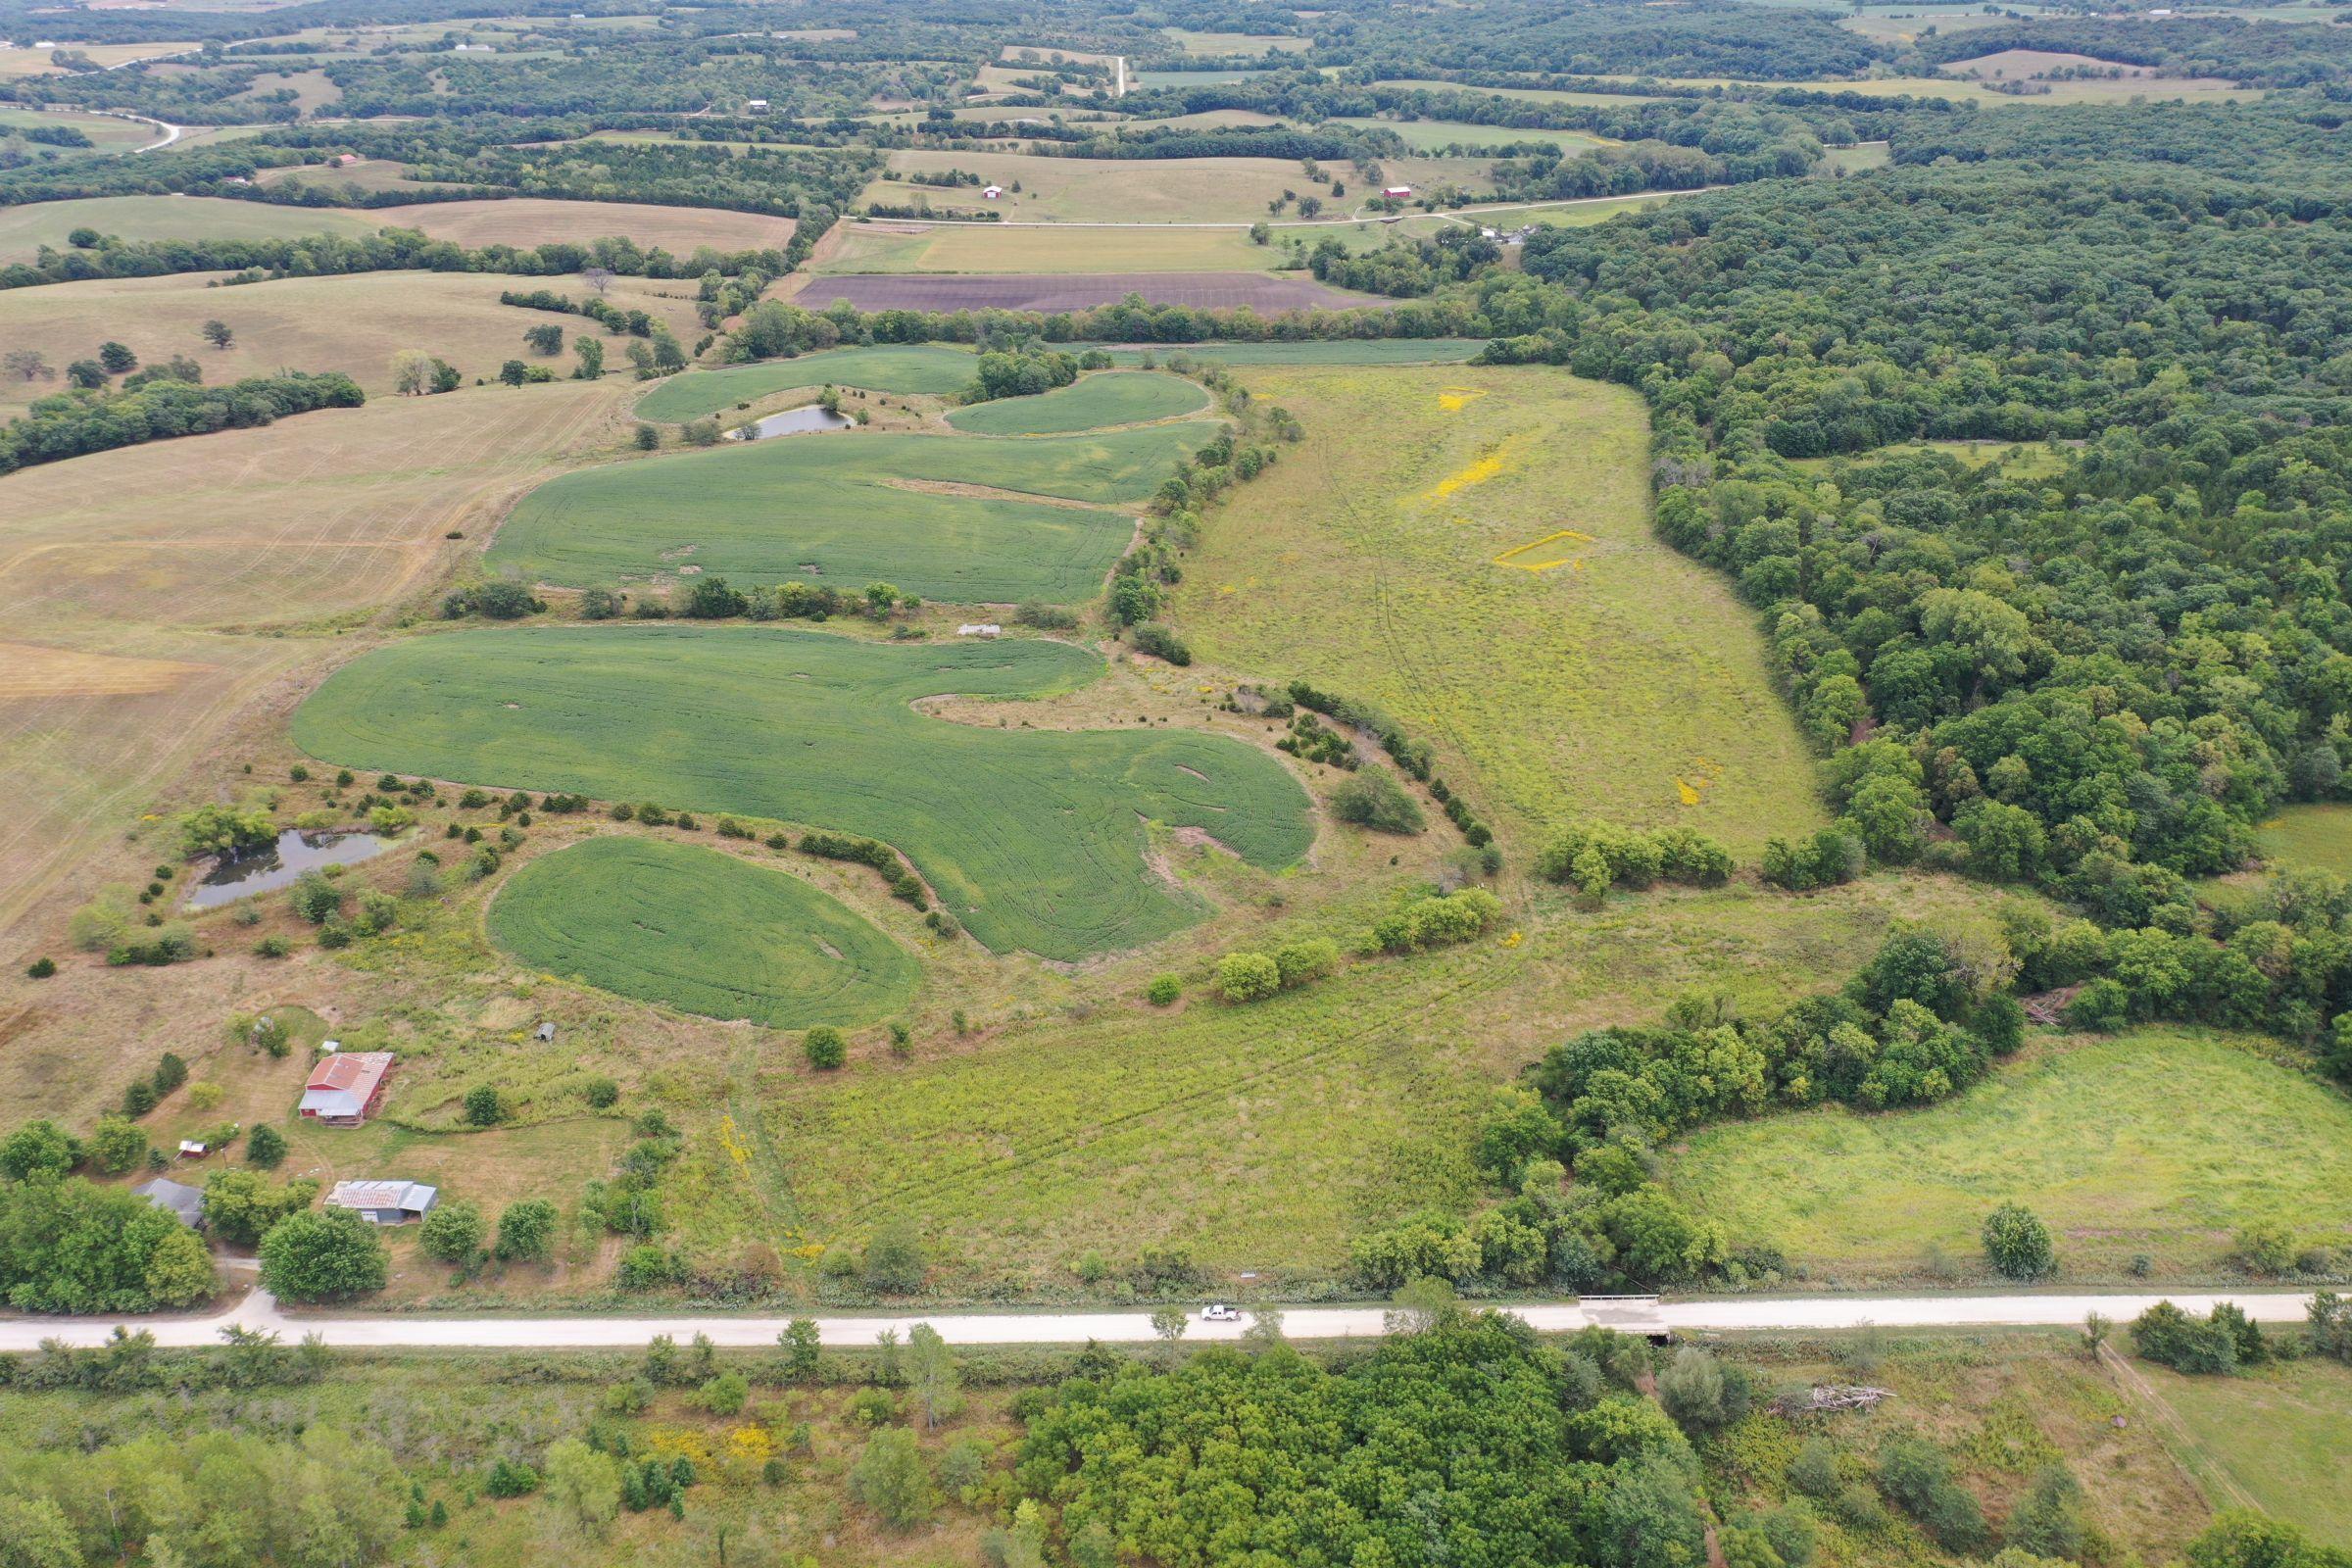 land-clarke-county-iowa-86-acres-listing-number-15147-1-2020-09-02-143148.jpg